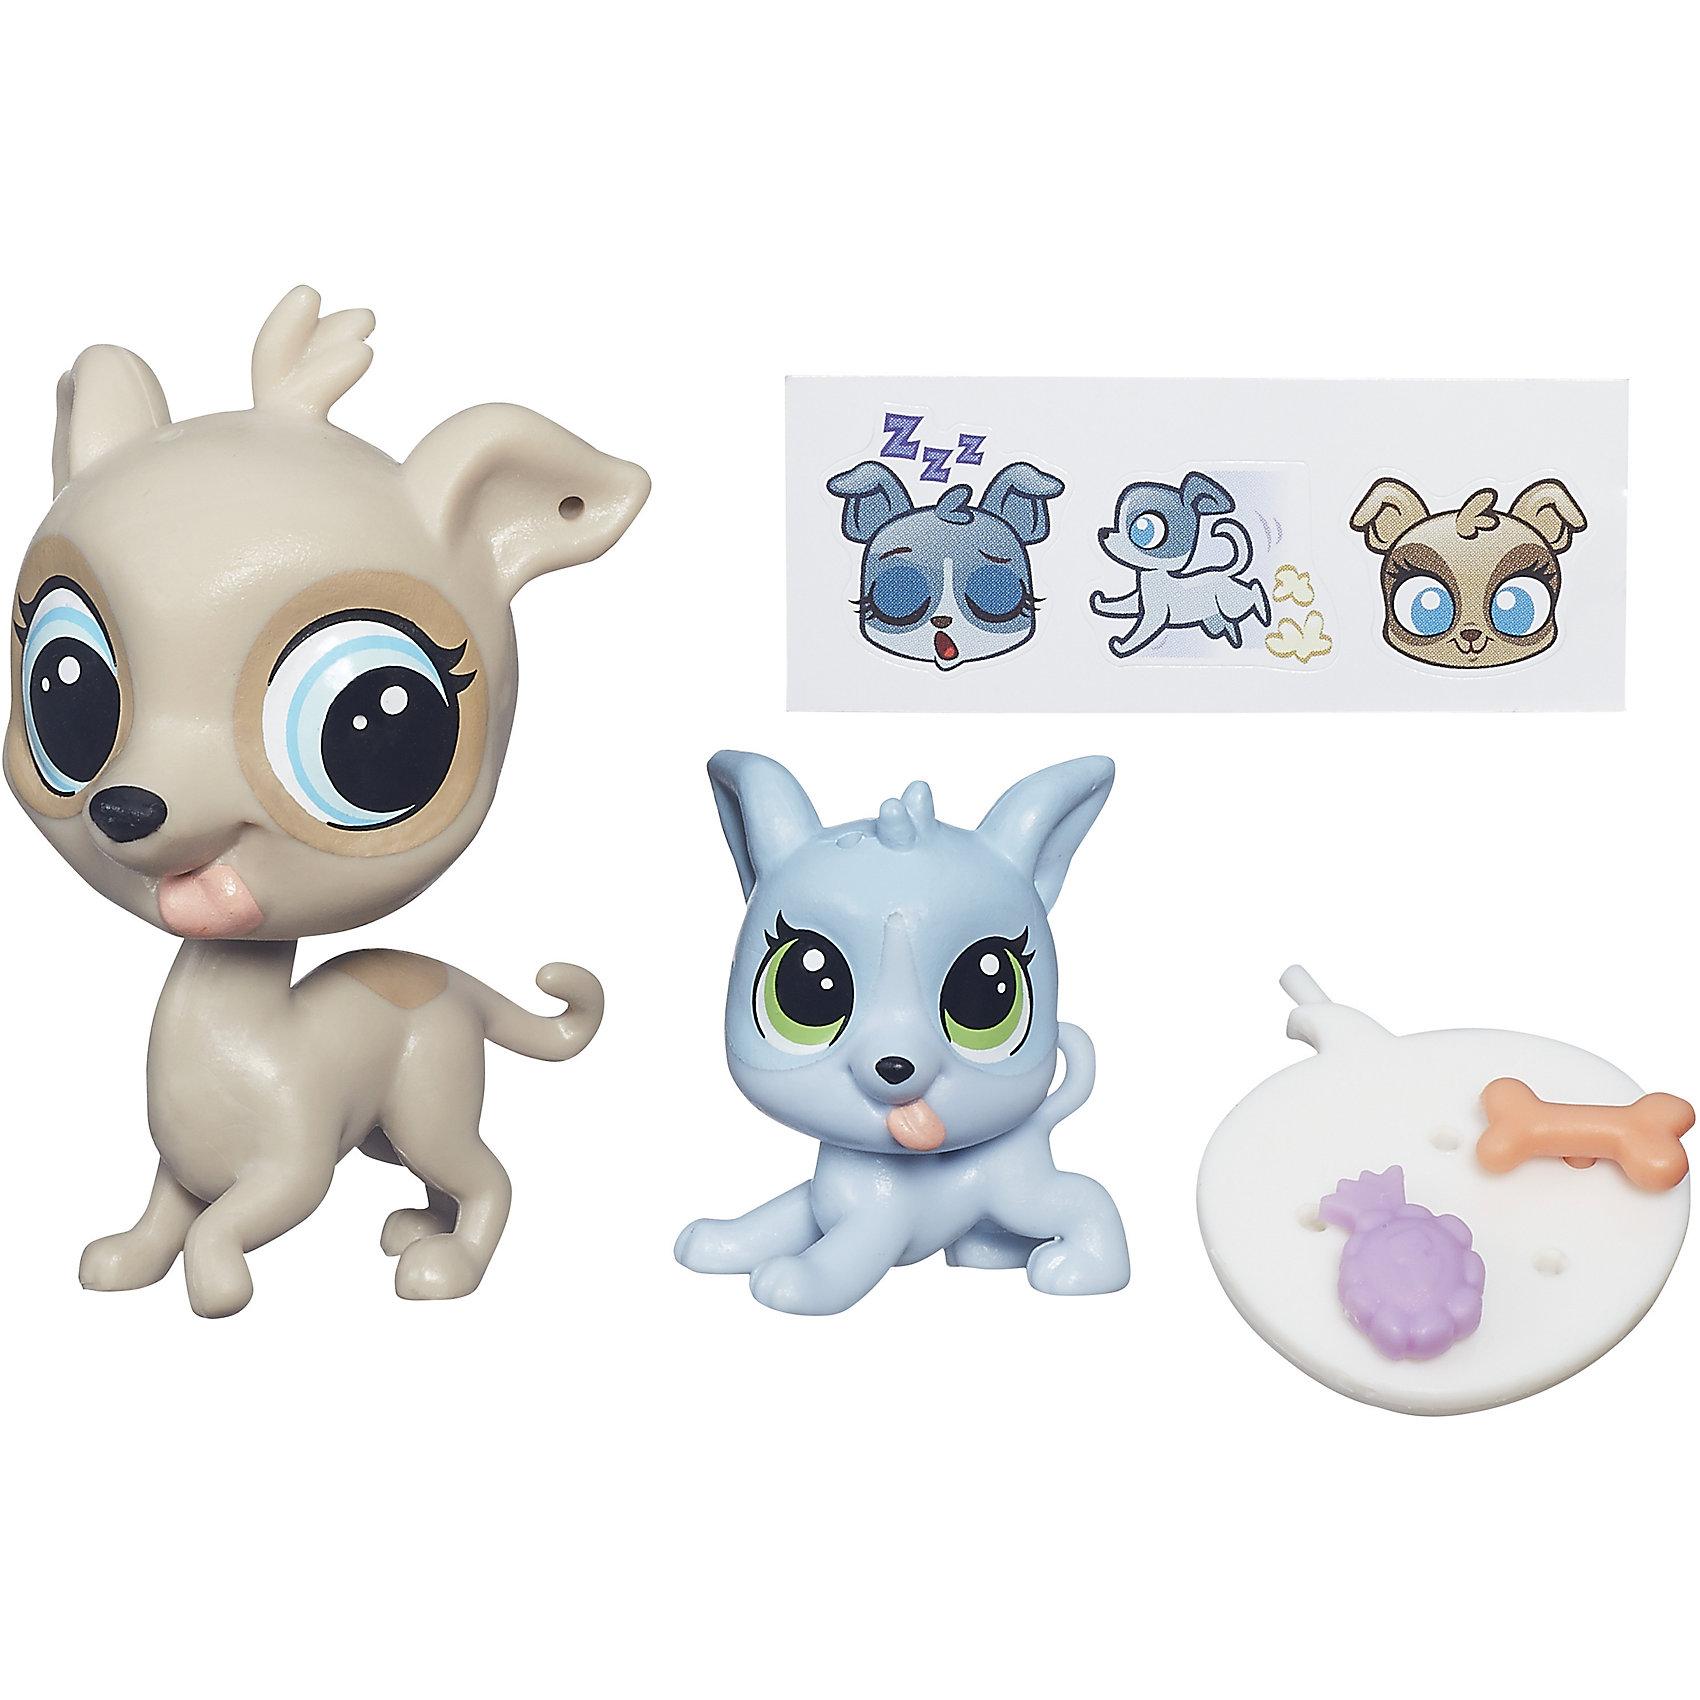 Hasbro Зверюшка и ее малыш, Littlest Pet Shop, А7313/B4765 фигурка littlest pet shop зверюшка в закрытой упаковке 5 см в ассортименте